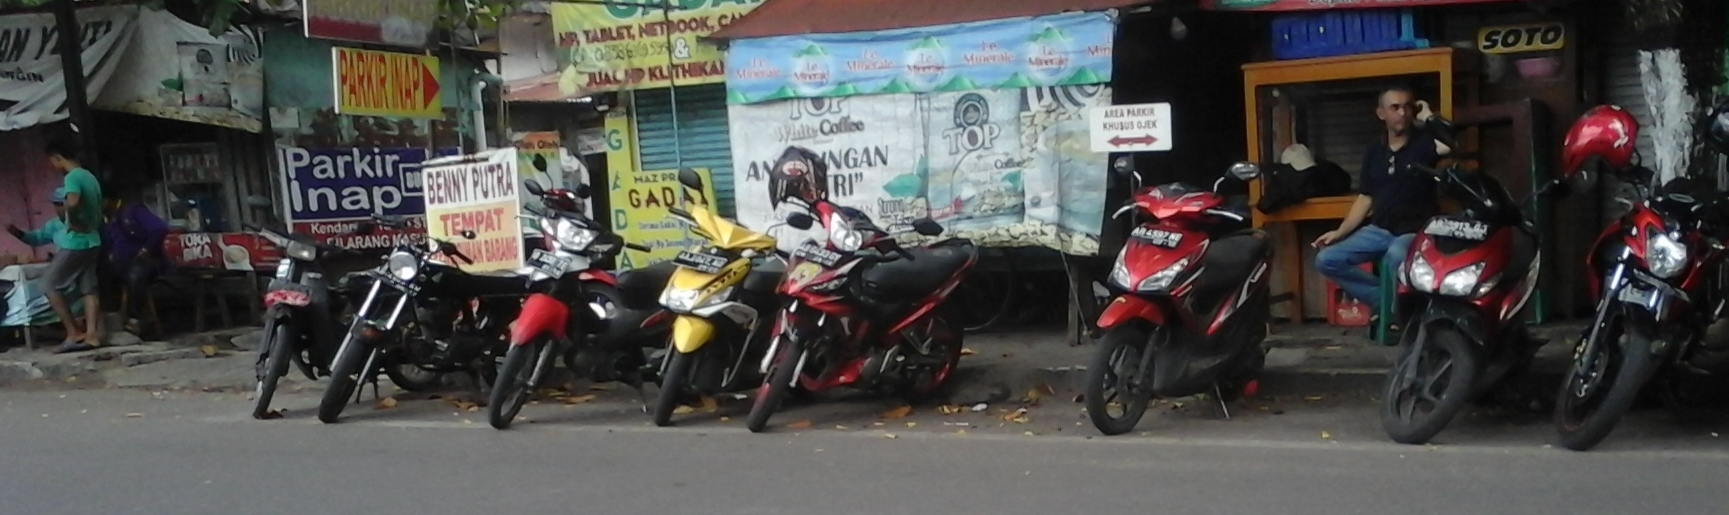 Ricuh GoJek di Jakarta tidak mempengaruhi aktivitas pengojek di Yogyakarta.